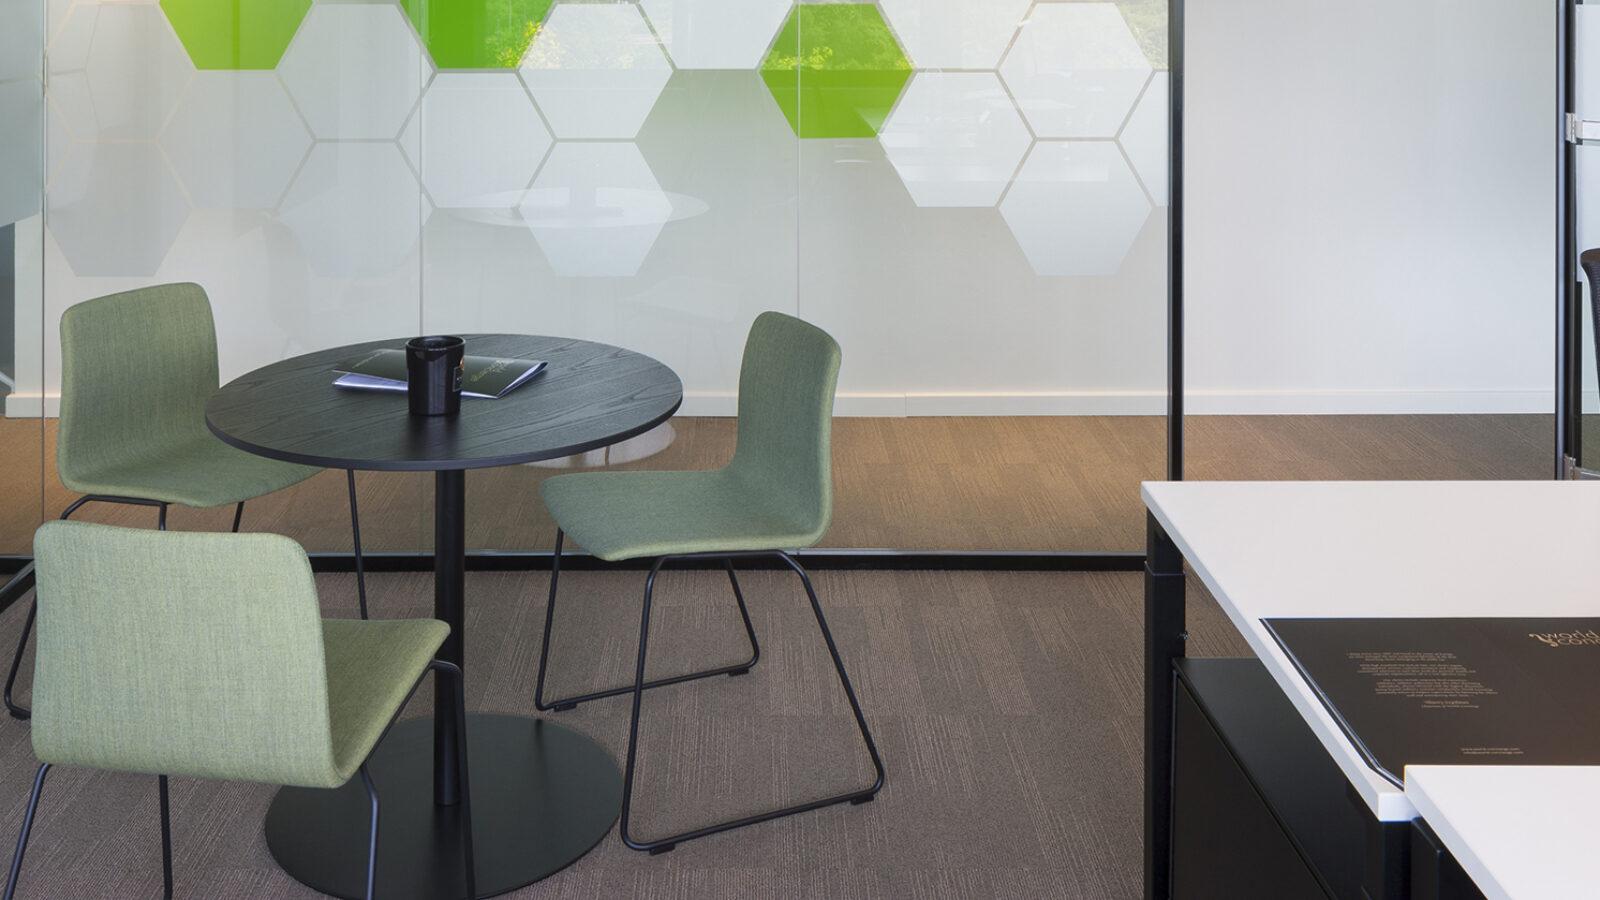 Serviced Office in Greenhouse Antwerp